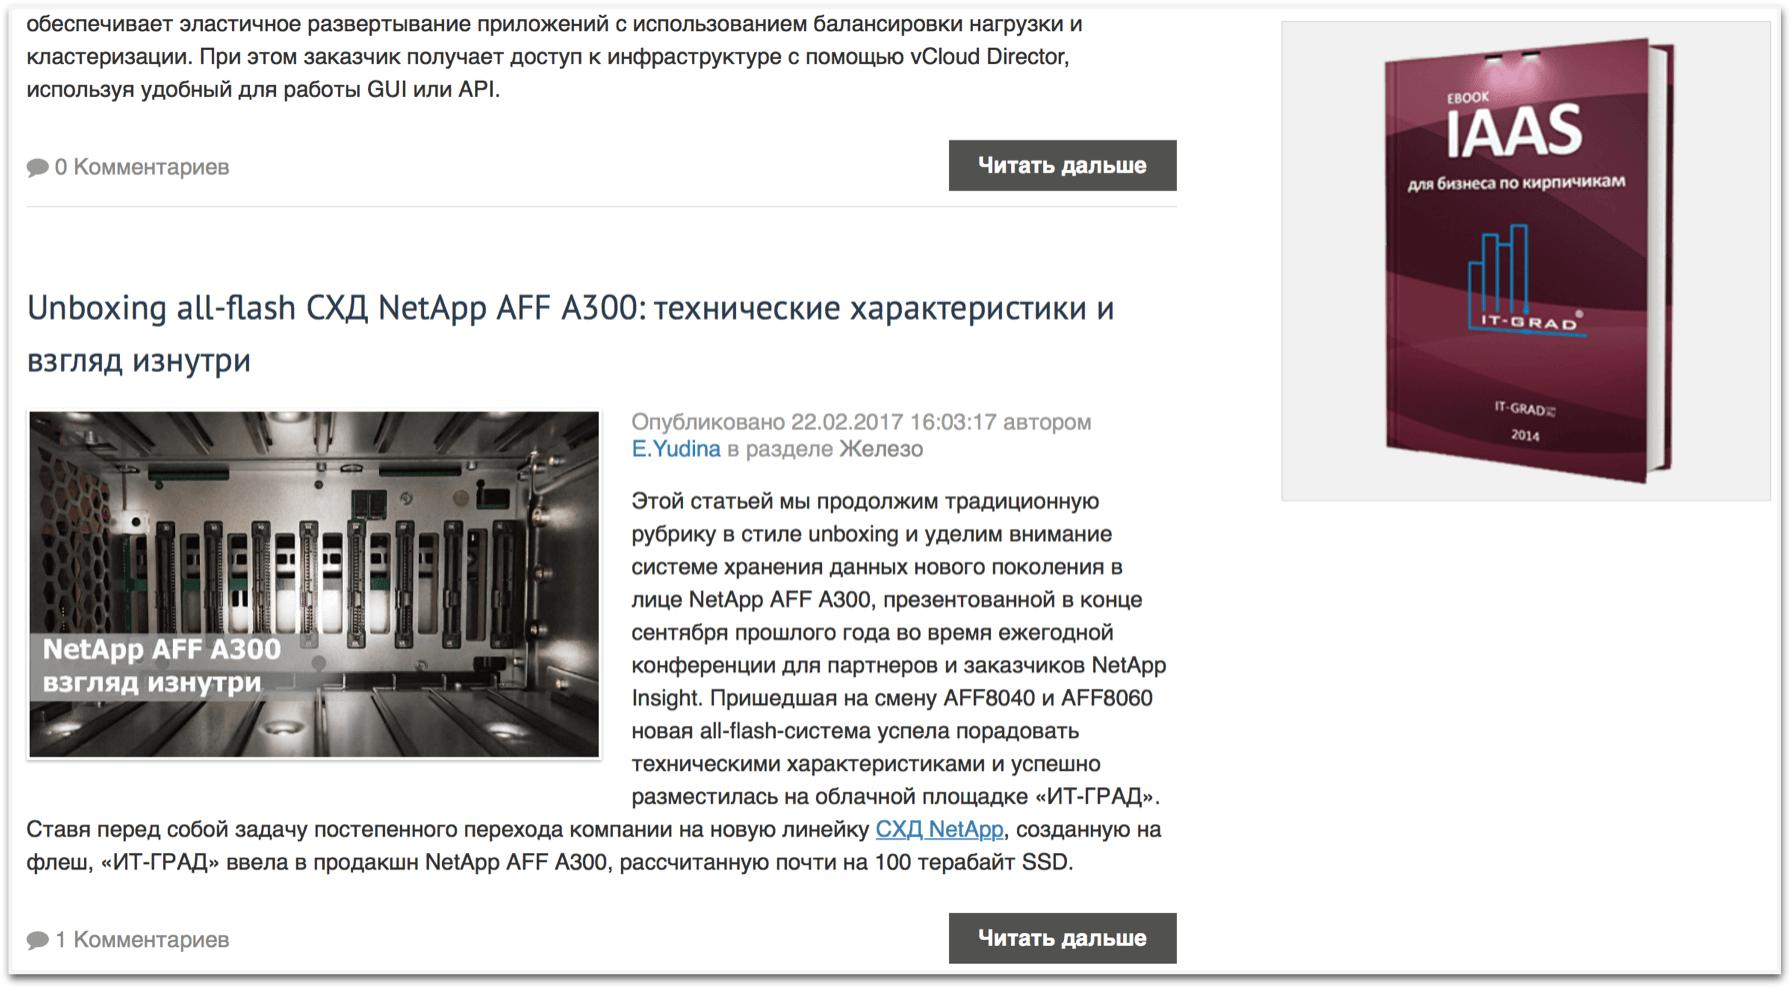 Кому интересен российский IaaS - 3